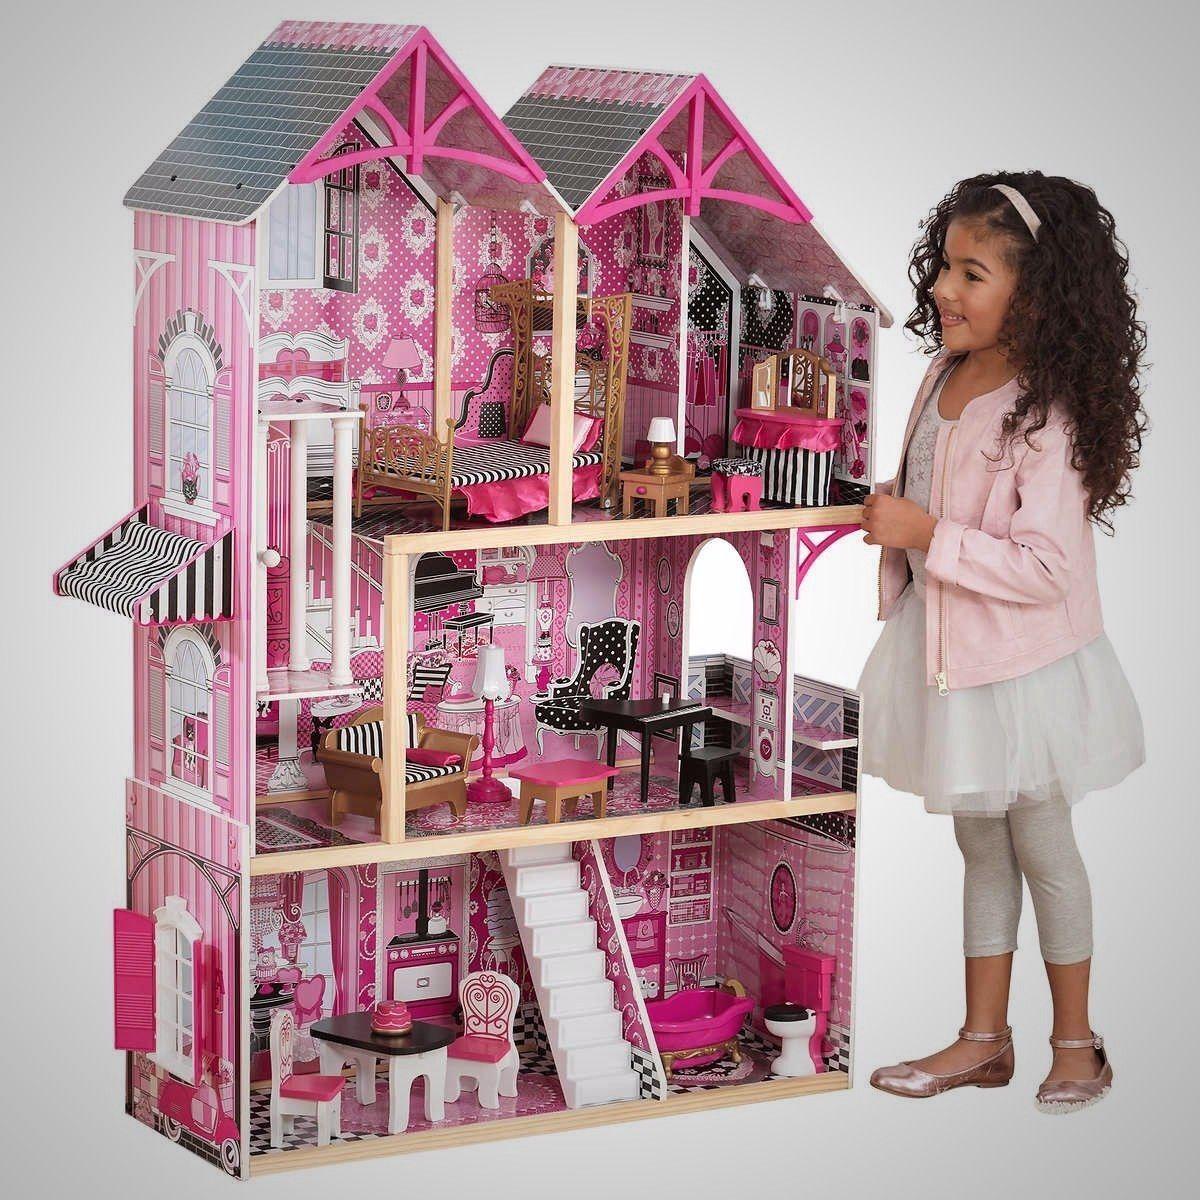 wooden barbie dollhouse furniture. Barbie-Size-Dollhouse-Furniture-Girls-Playhouse-Dream-Play- Wooden Barbie Dollhouse Furniture